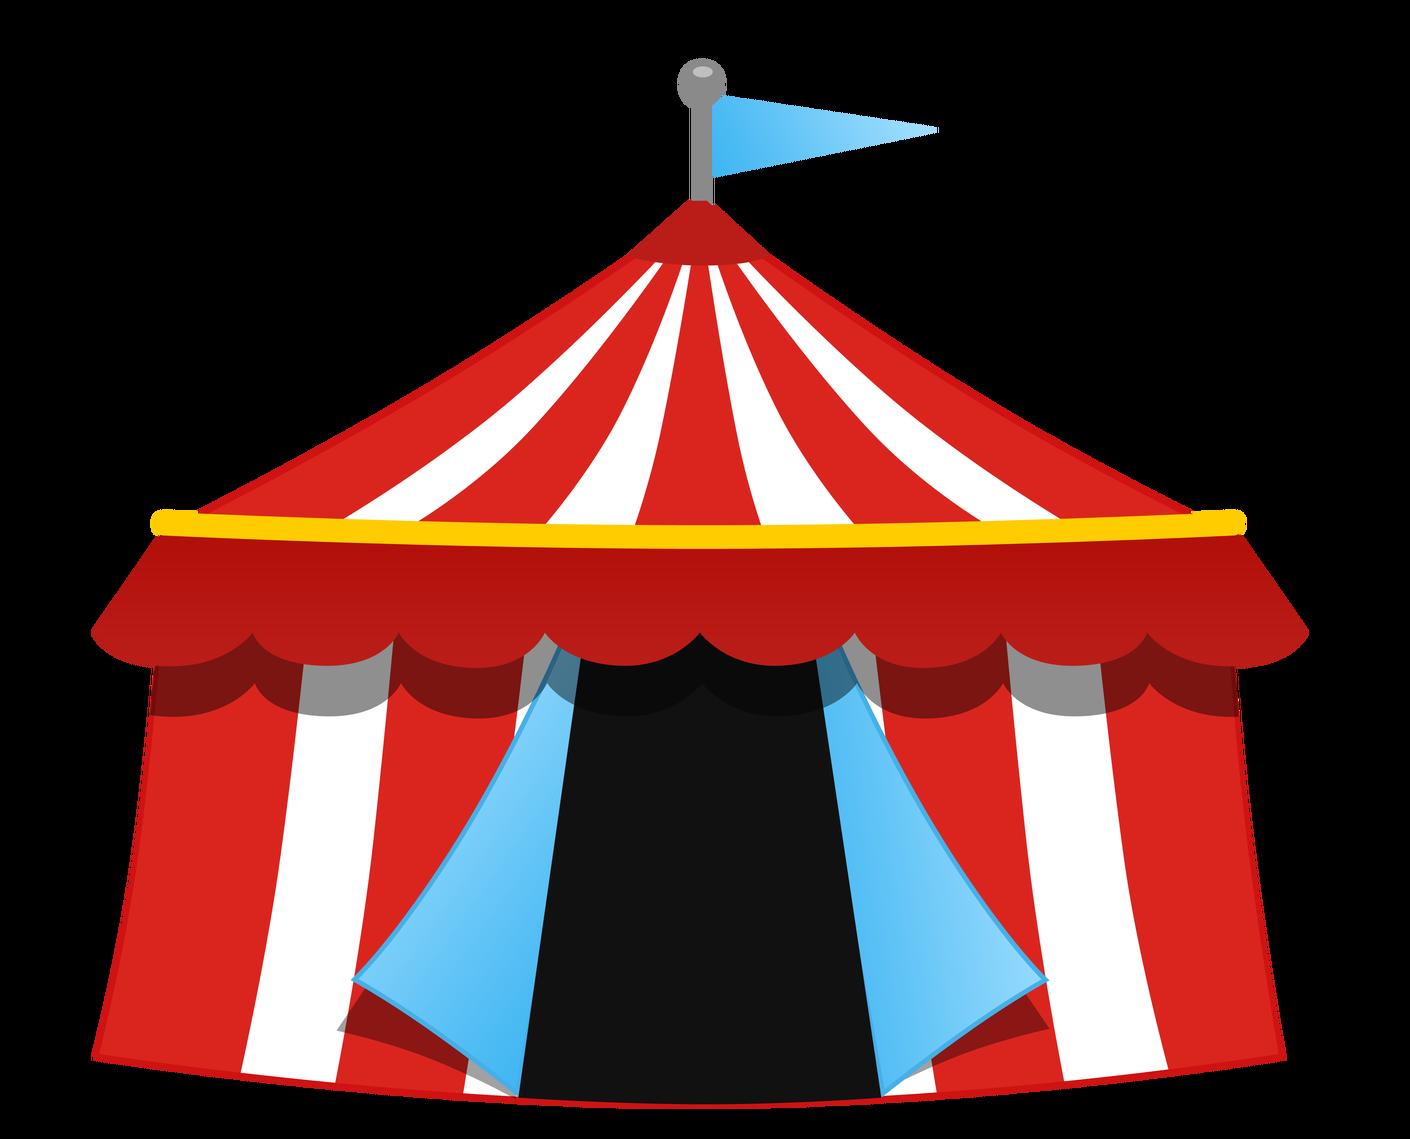 Circo lona tenda pinterest. Circus clipart fair